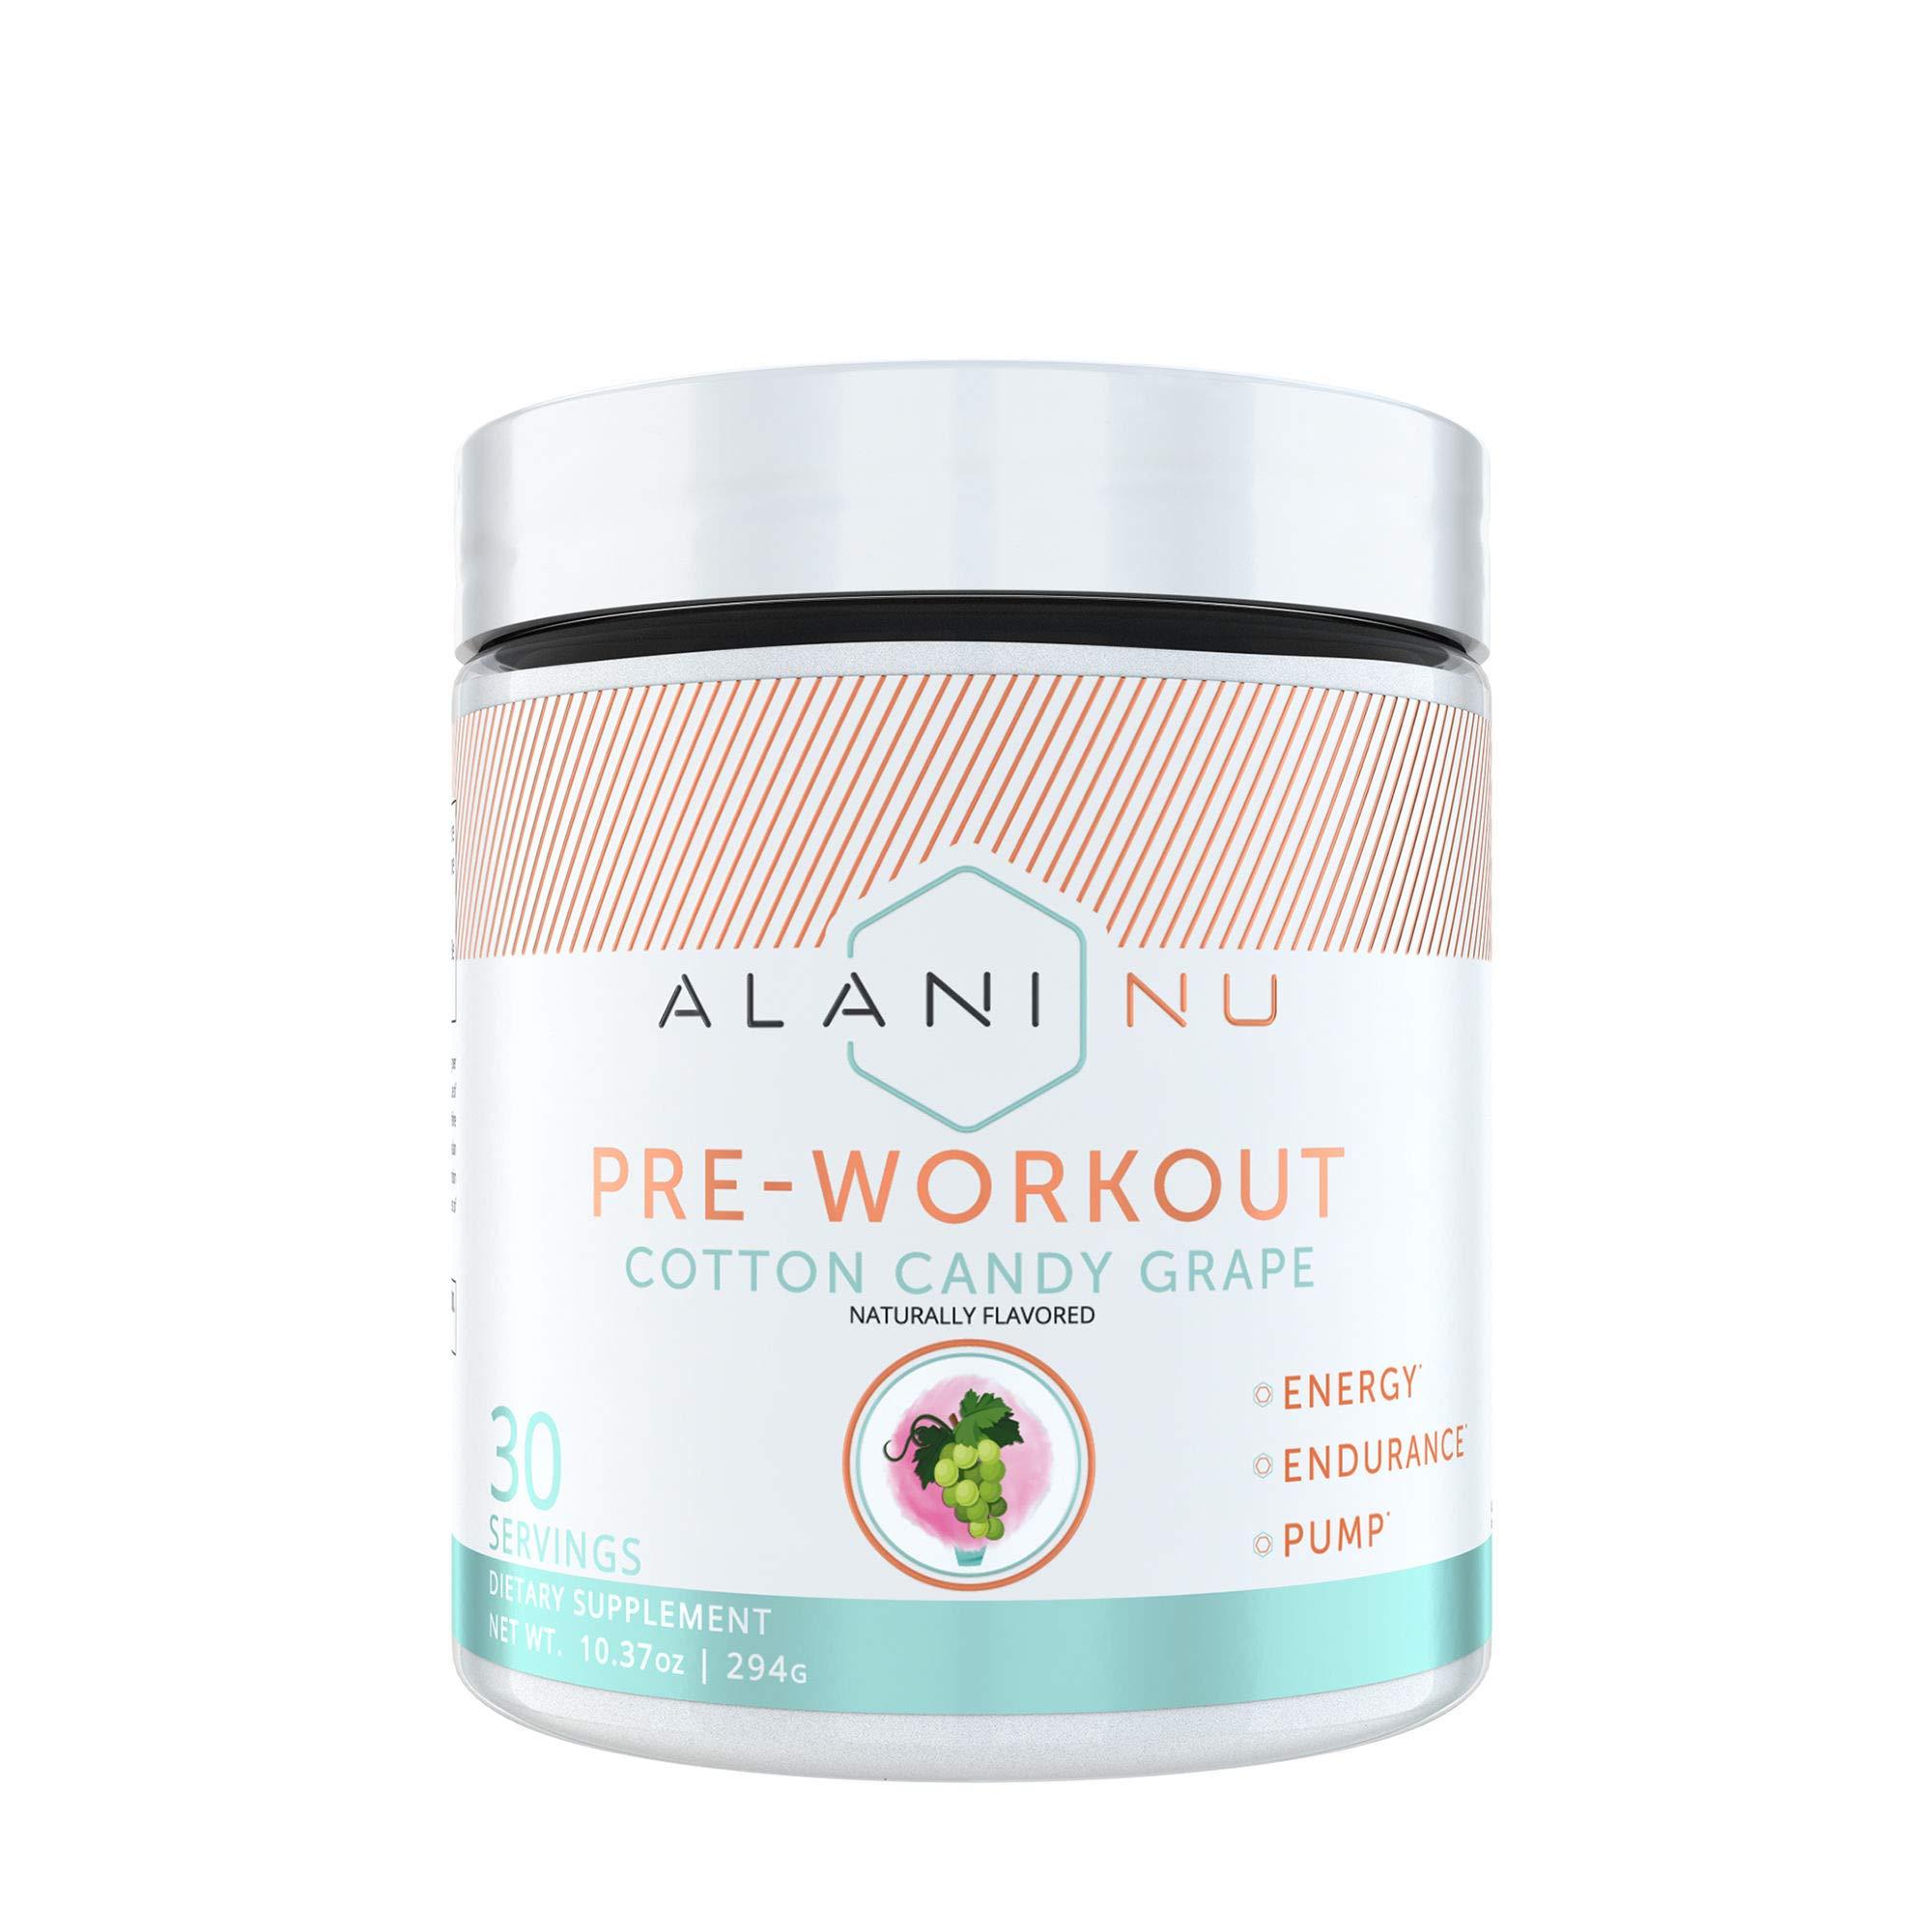 Alani Nu Pre-Workout - Cotton Candy Grape by Alani Nu